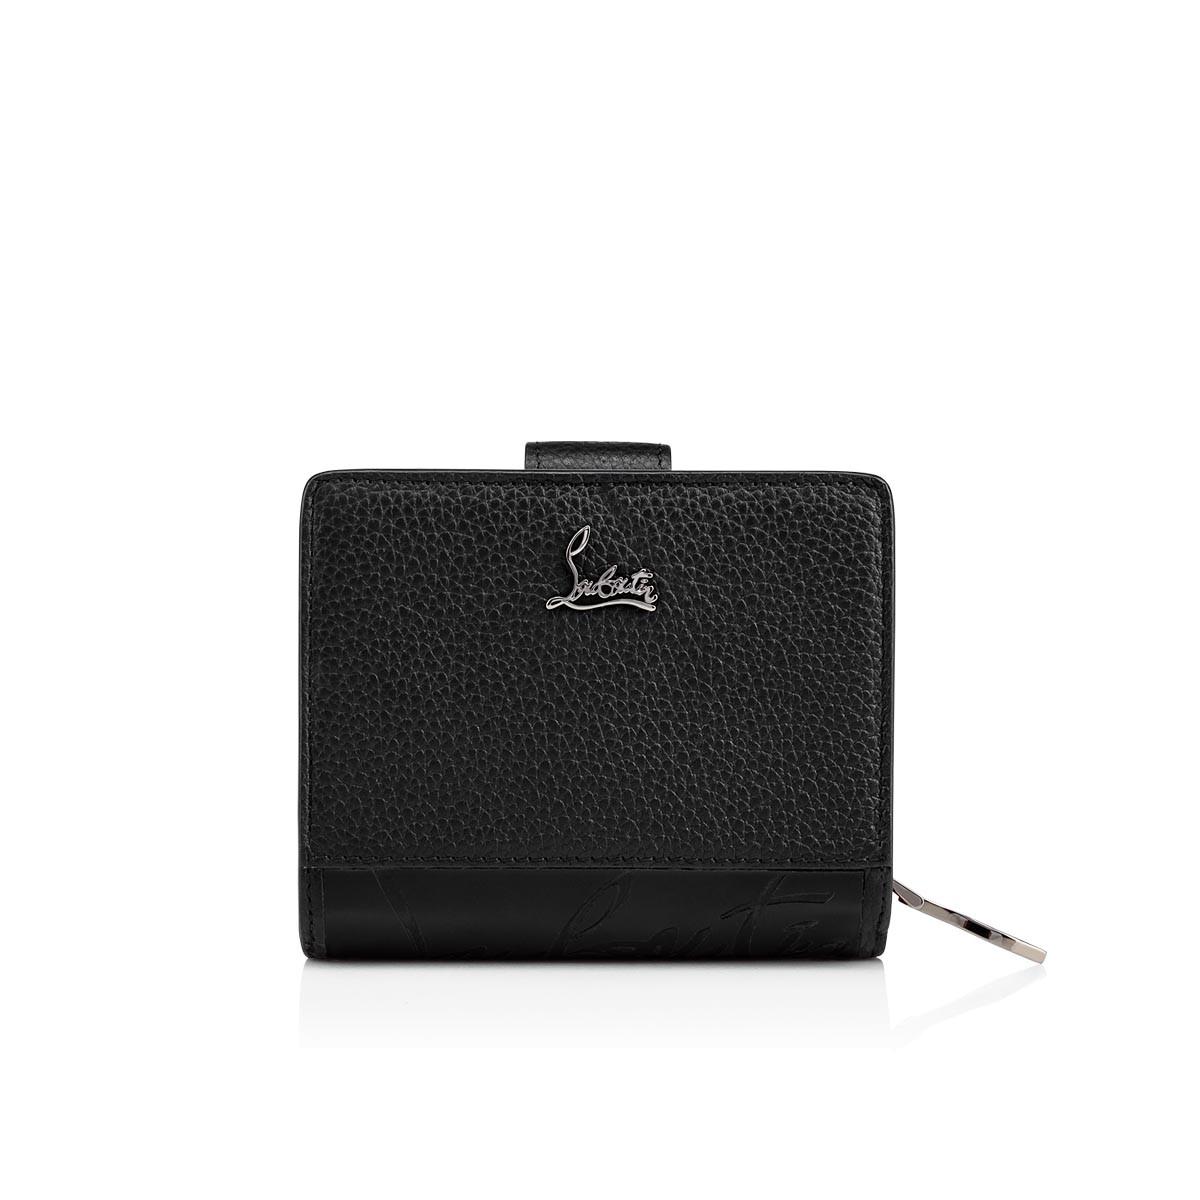 Small Leather Goods - Paloma Mini Wallet - Christian Louboutin